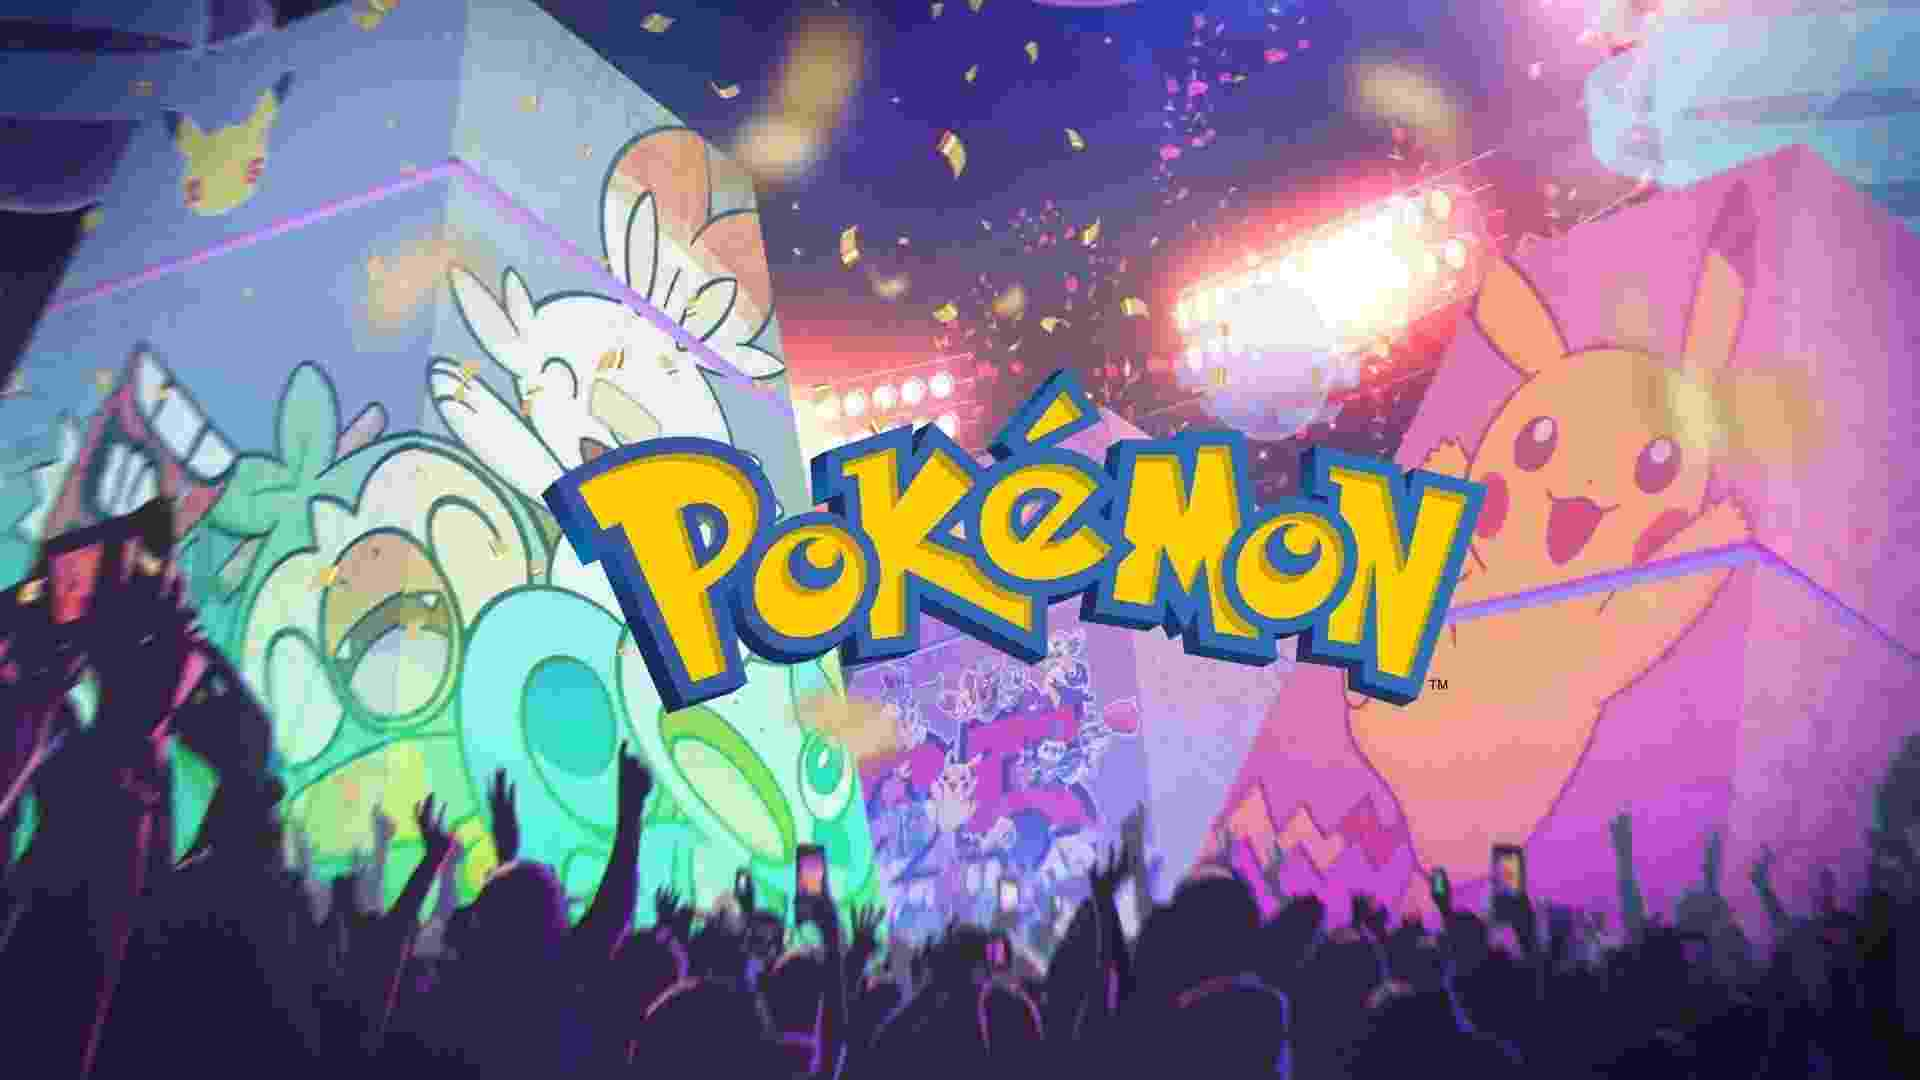 Pokémon - Reprodução